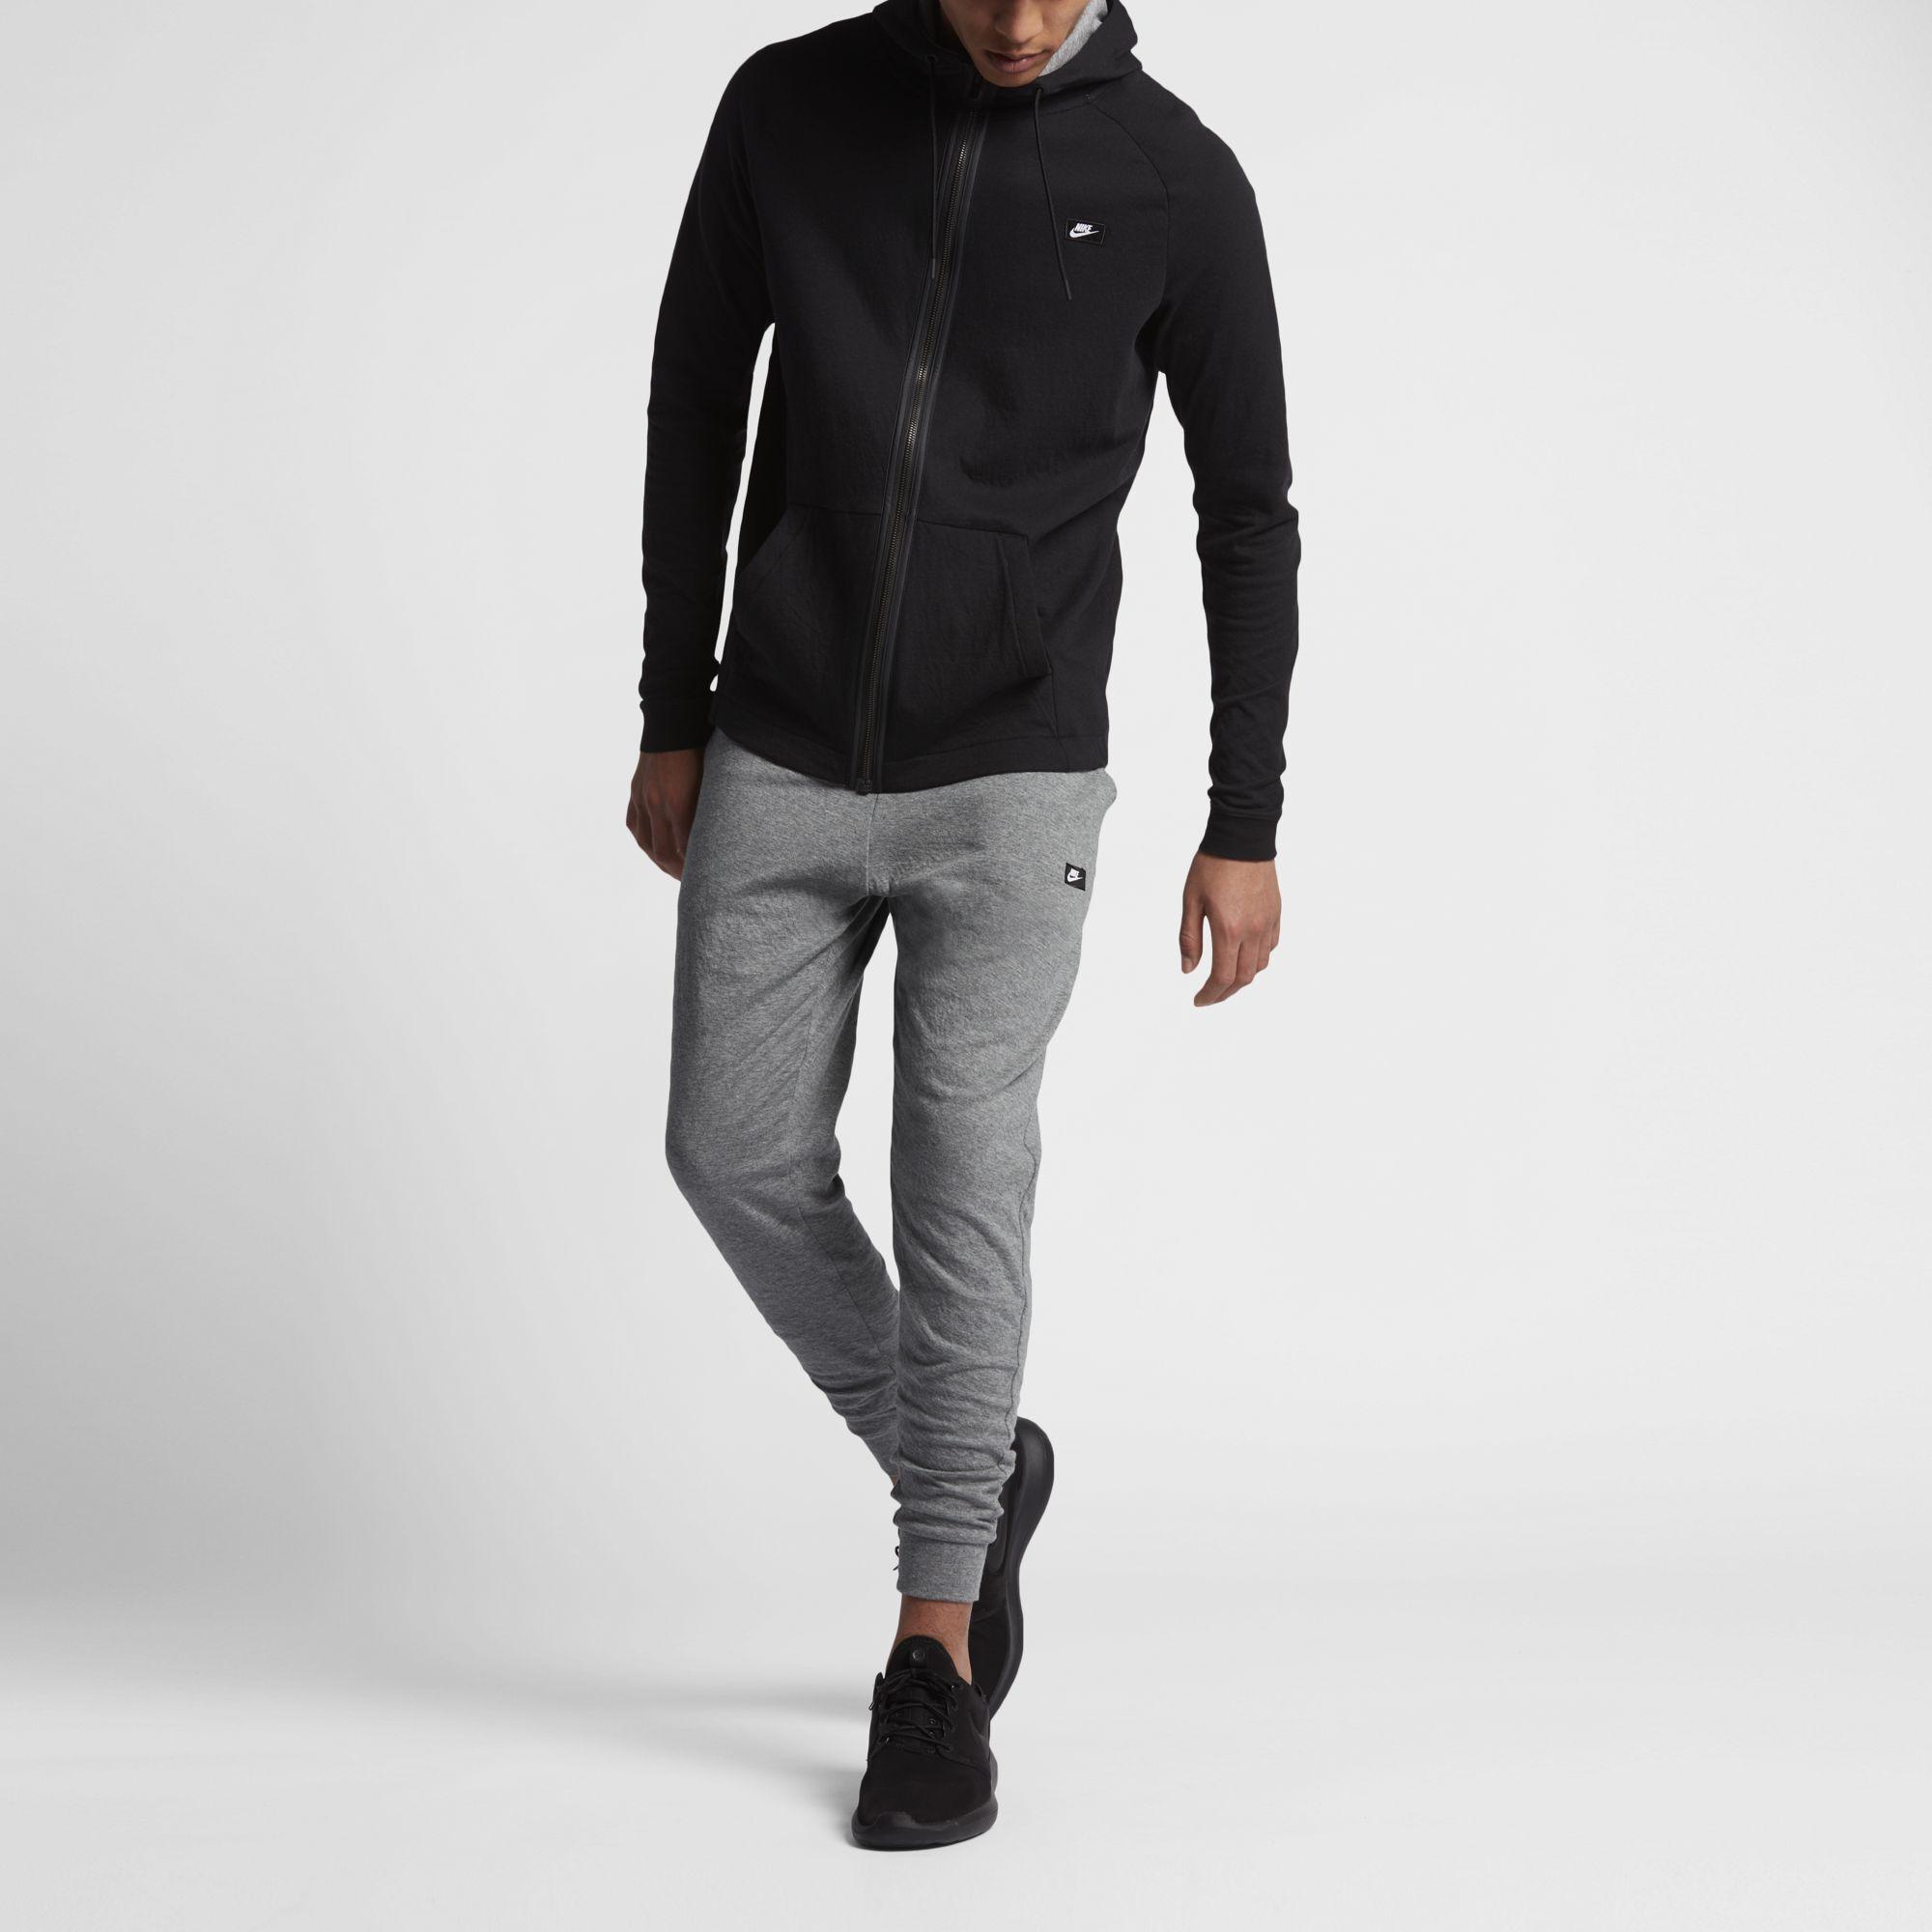 Nike Jggr Sportswear Wt Modern Hombre Lt wFwrPq